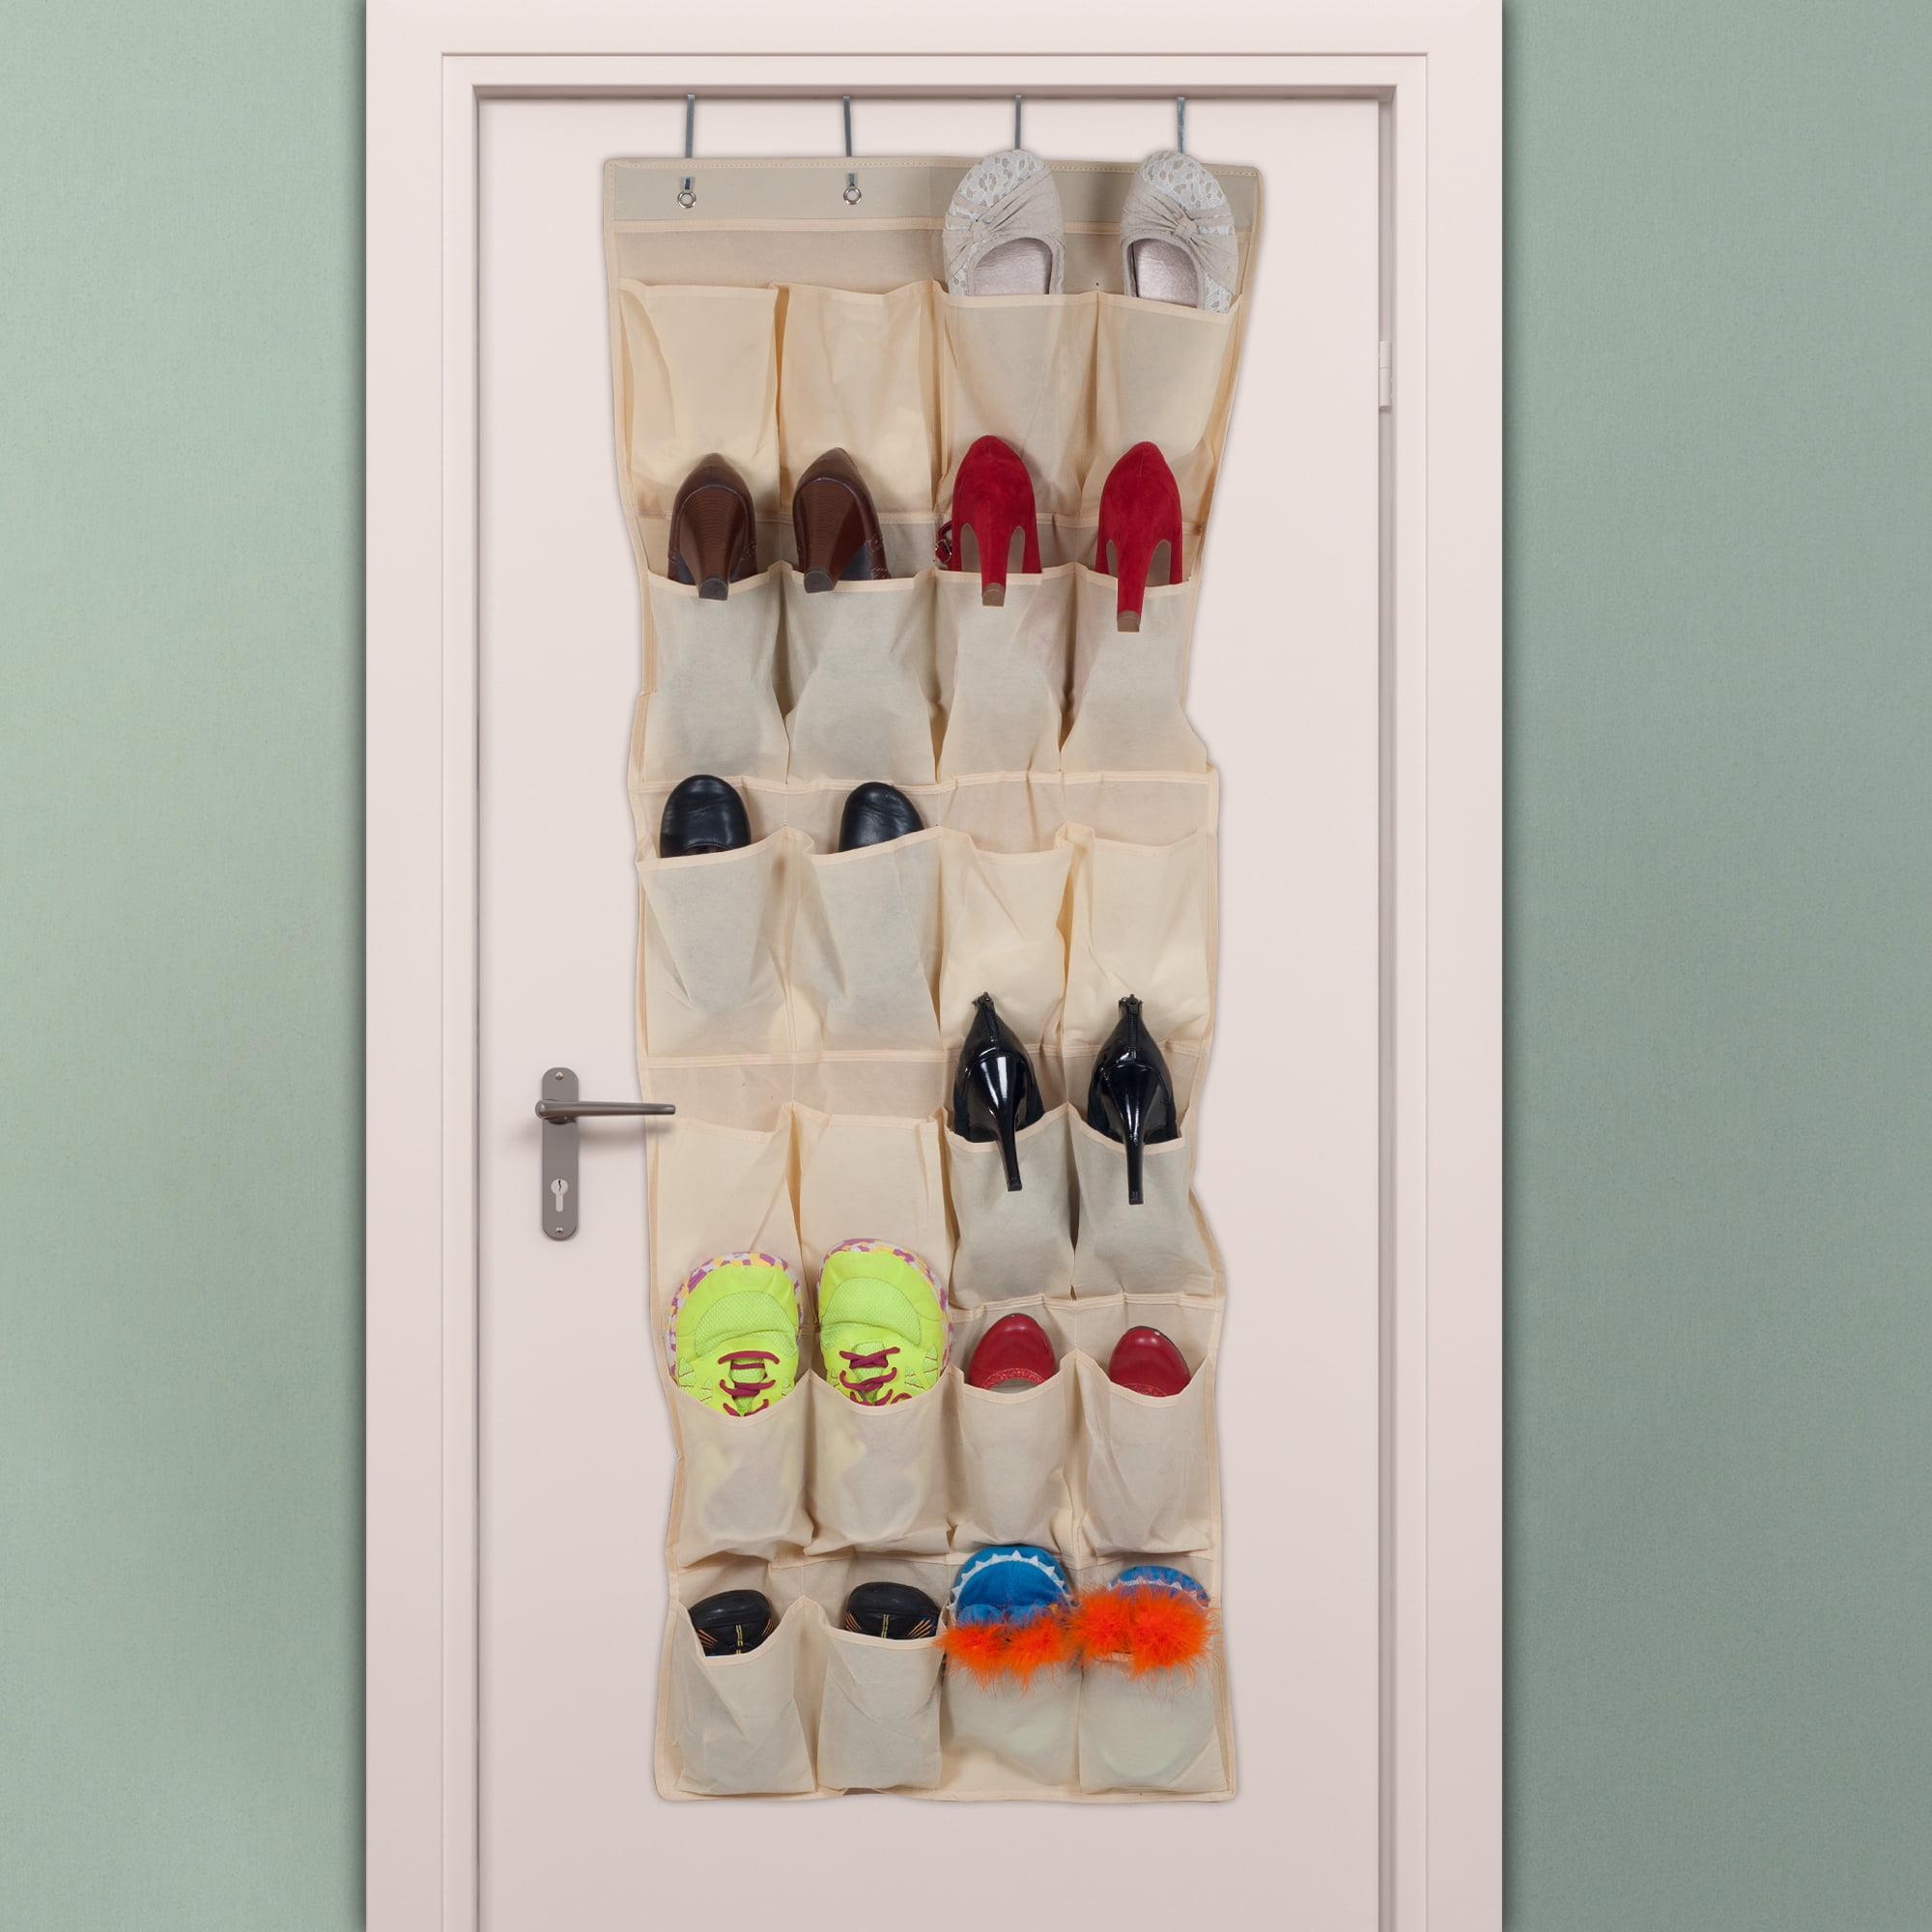 Lavish Home Over the Door Shoe Organizer - Fits 24 Shoes